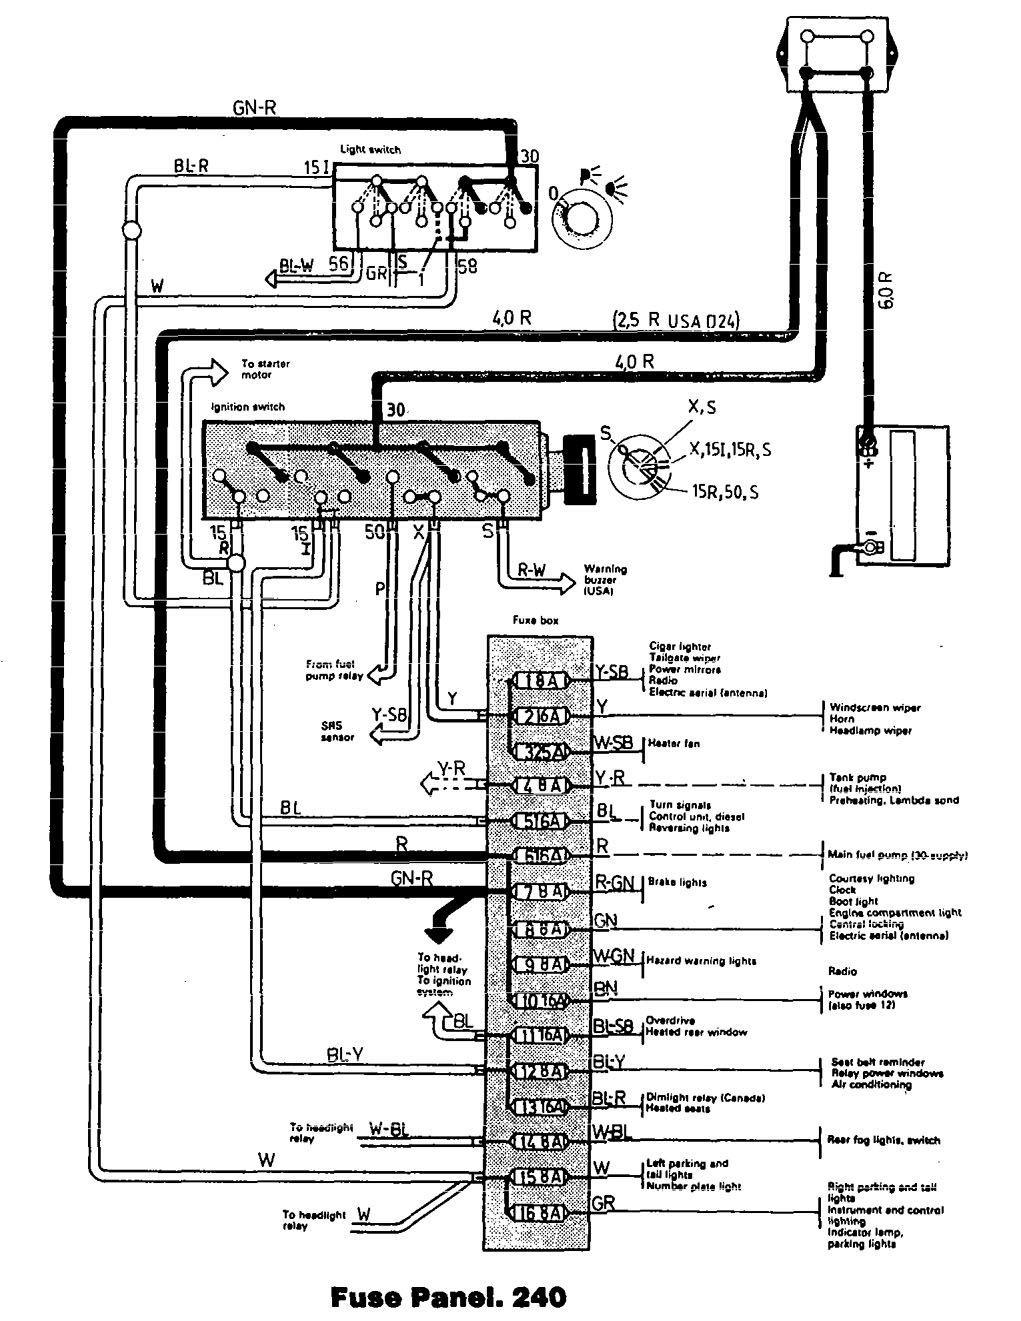 1992 Volvo 240 Wagon Wiring Diagram